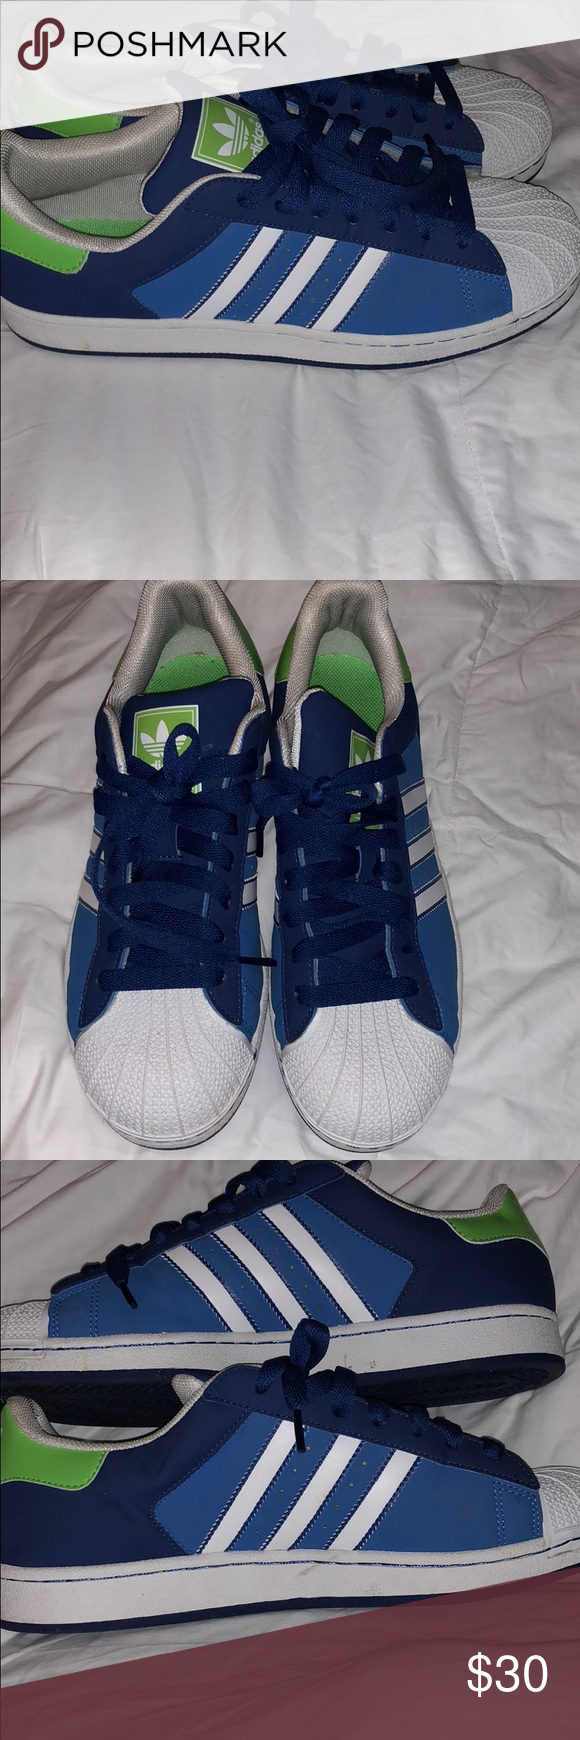 Men's Adidas Gently wore. Navy blue